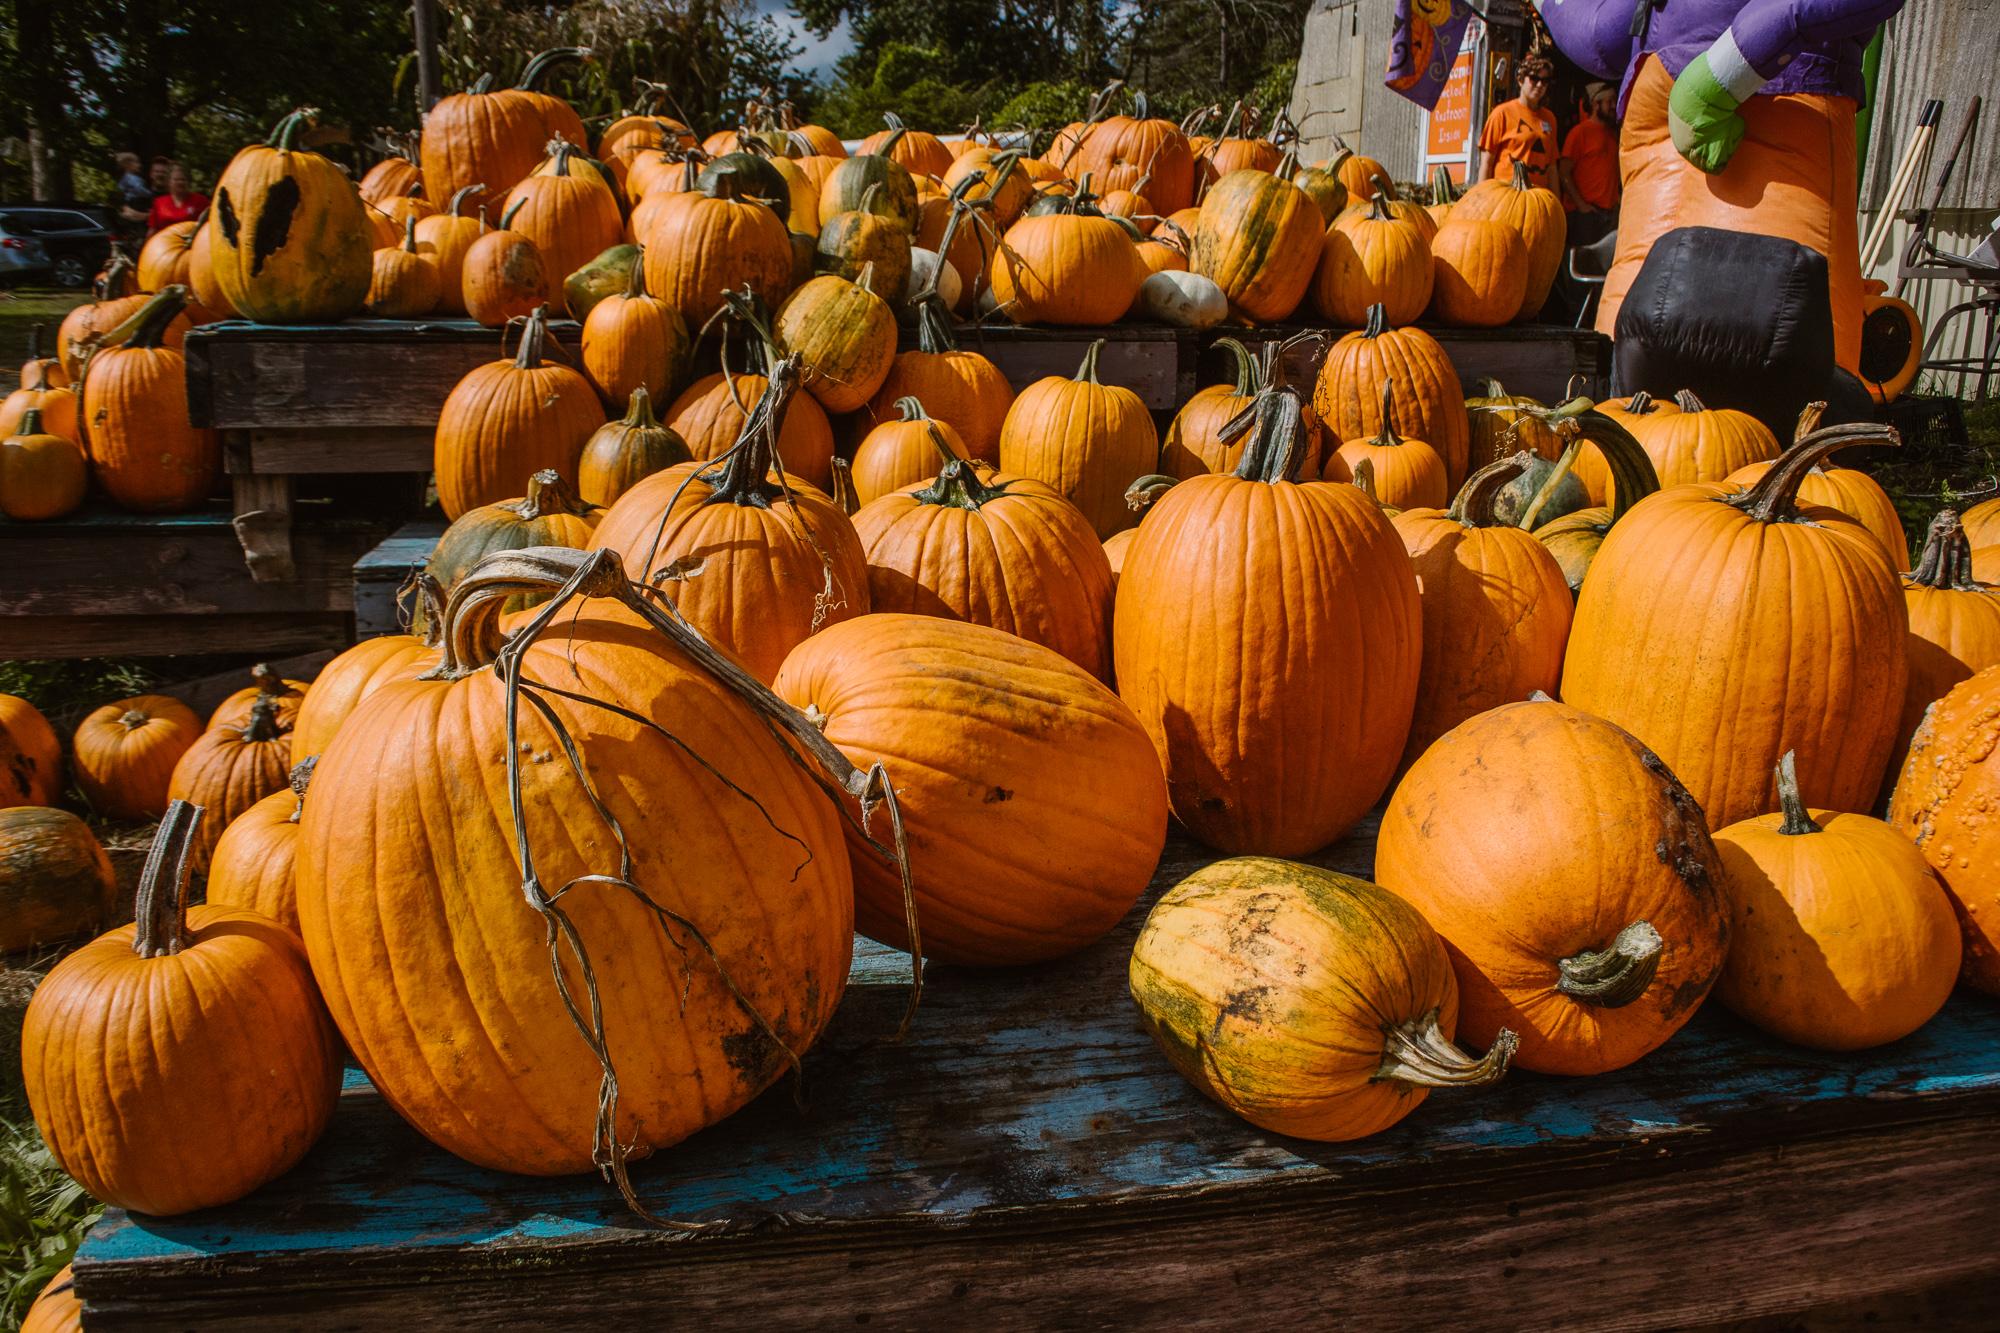 bethke-farms-pumpkin-patch-grand-haven-michigan (16).jpg